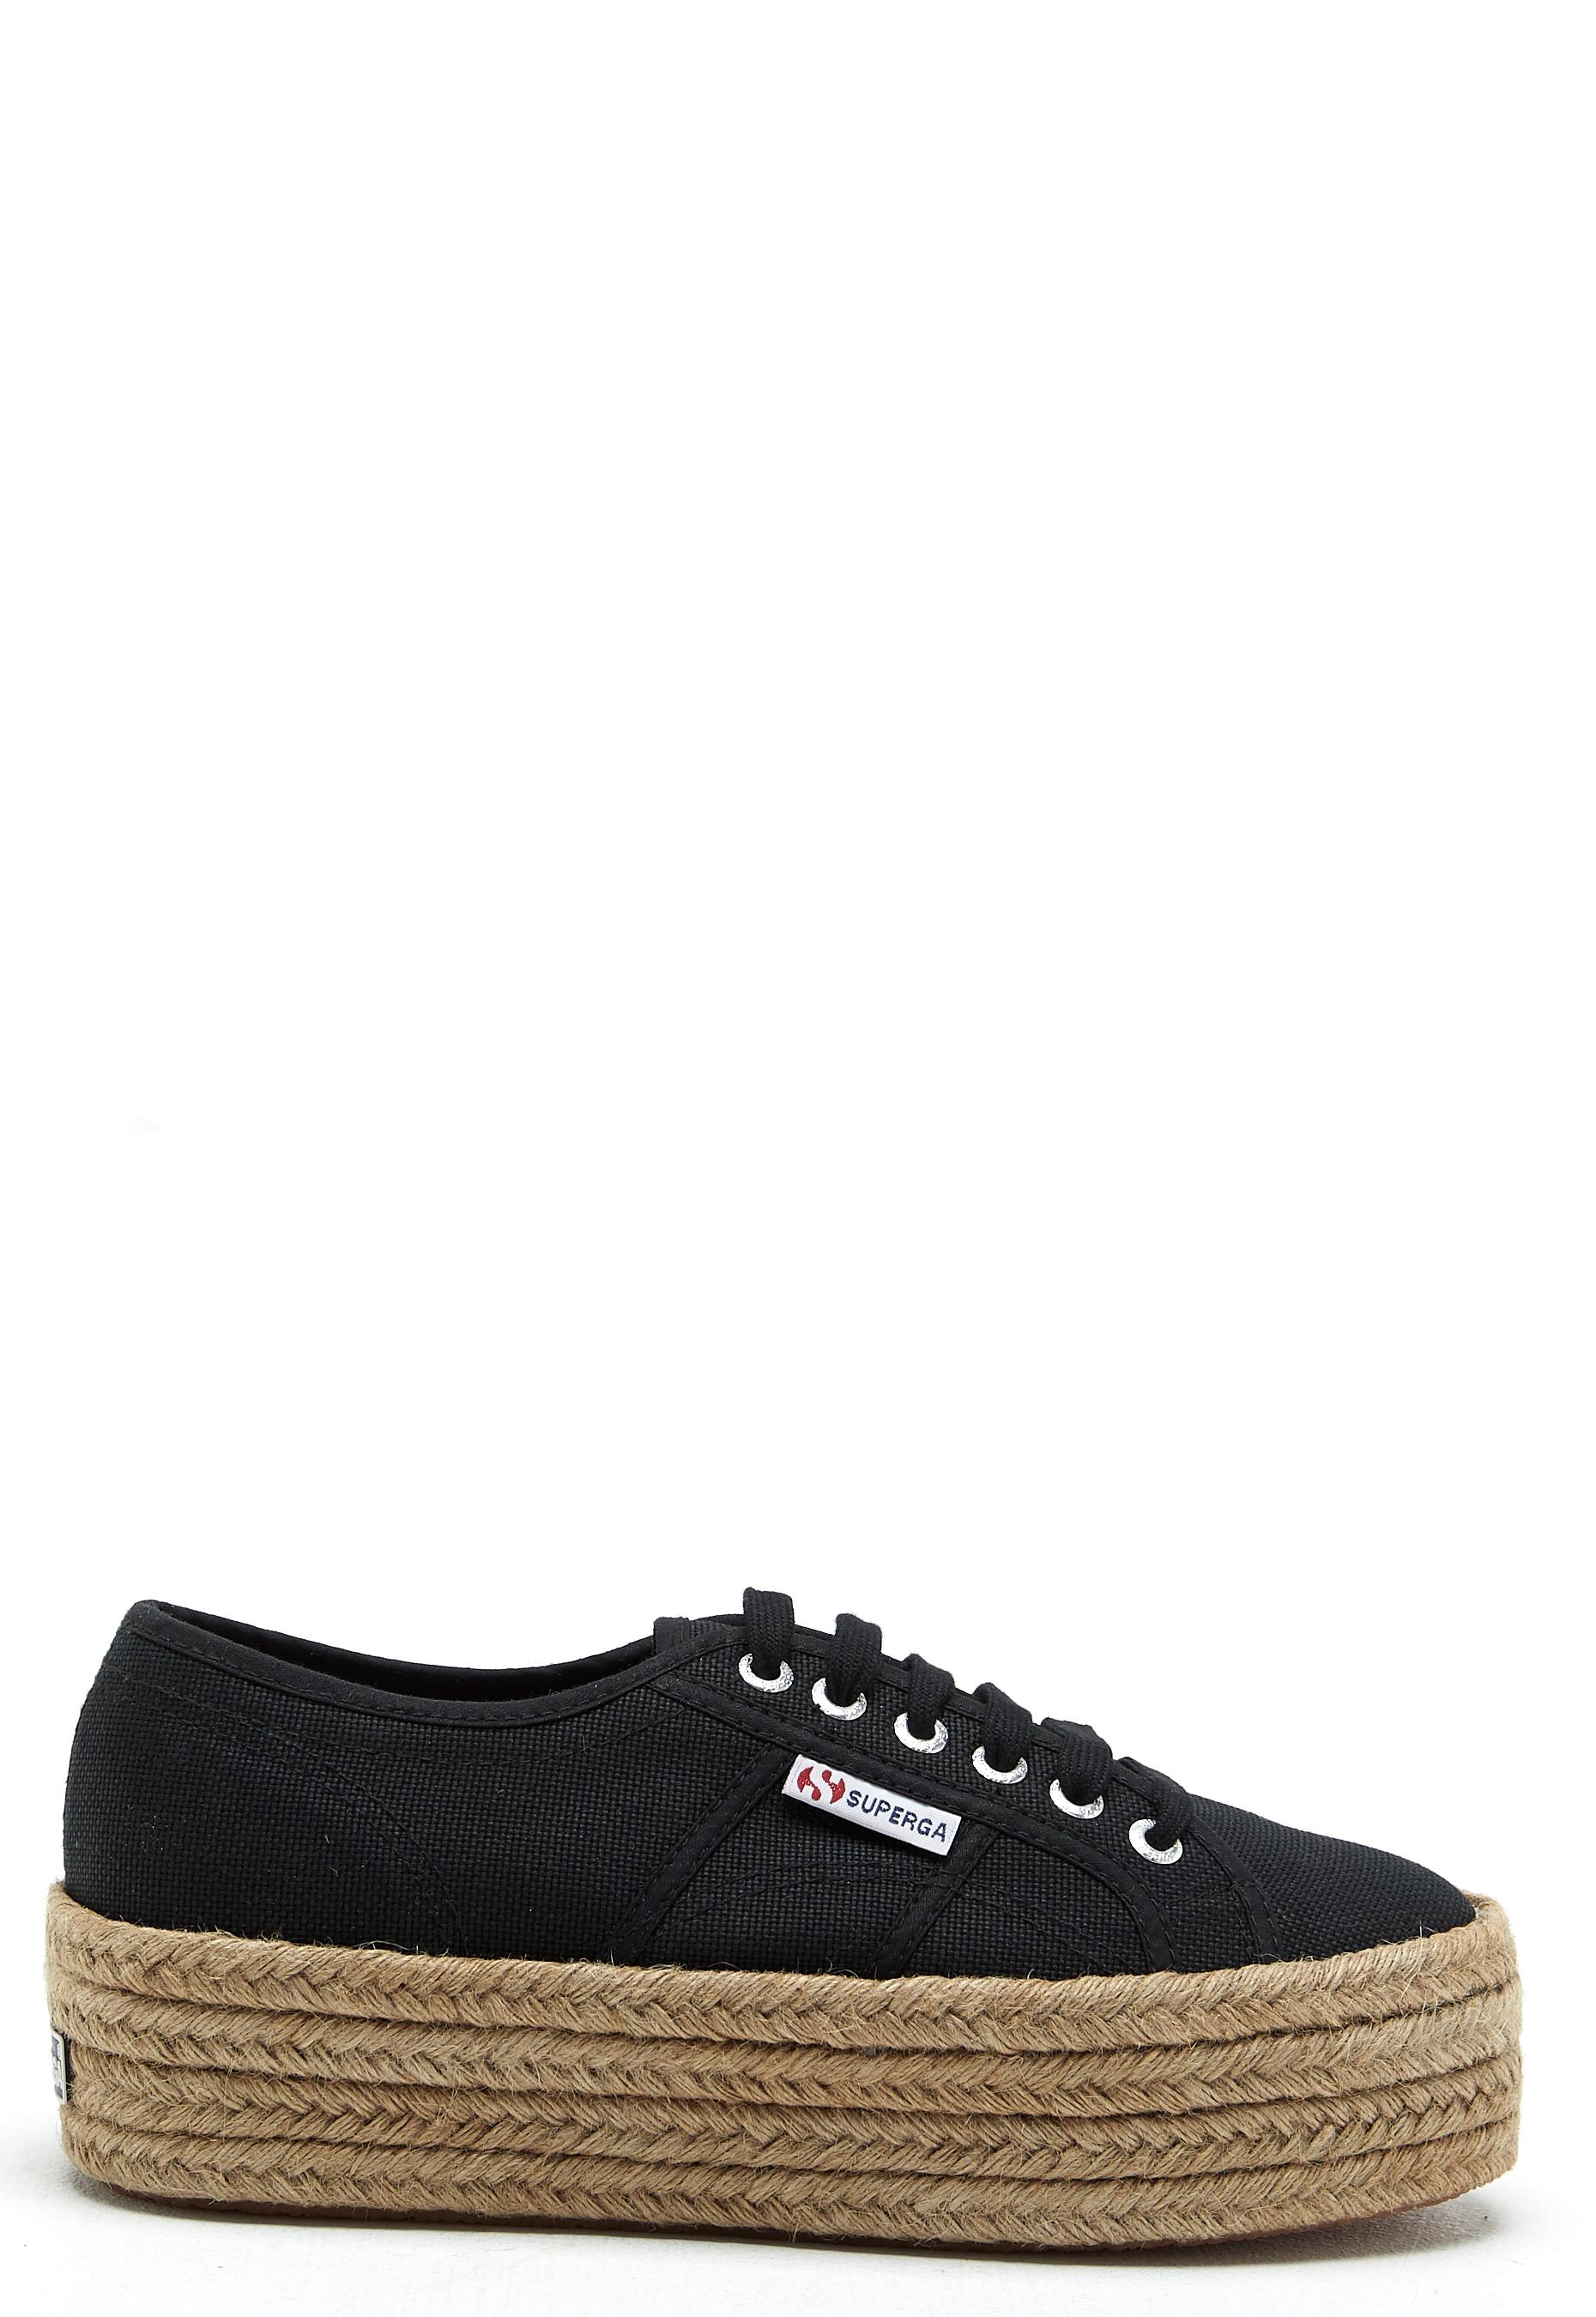 Superga Cotropew Sneakers Black